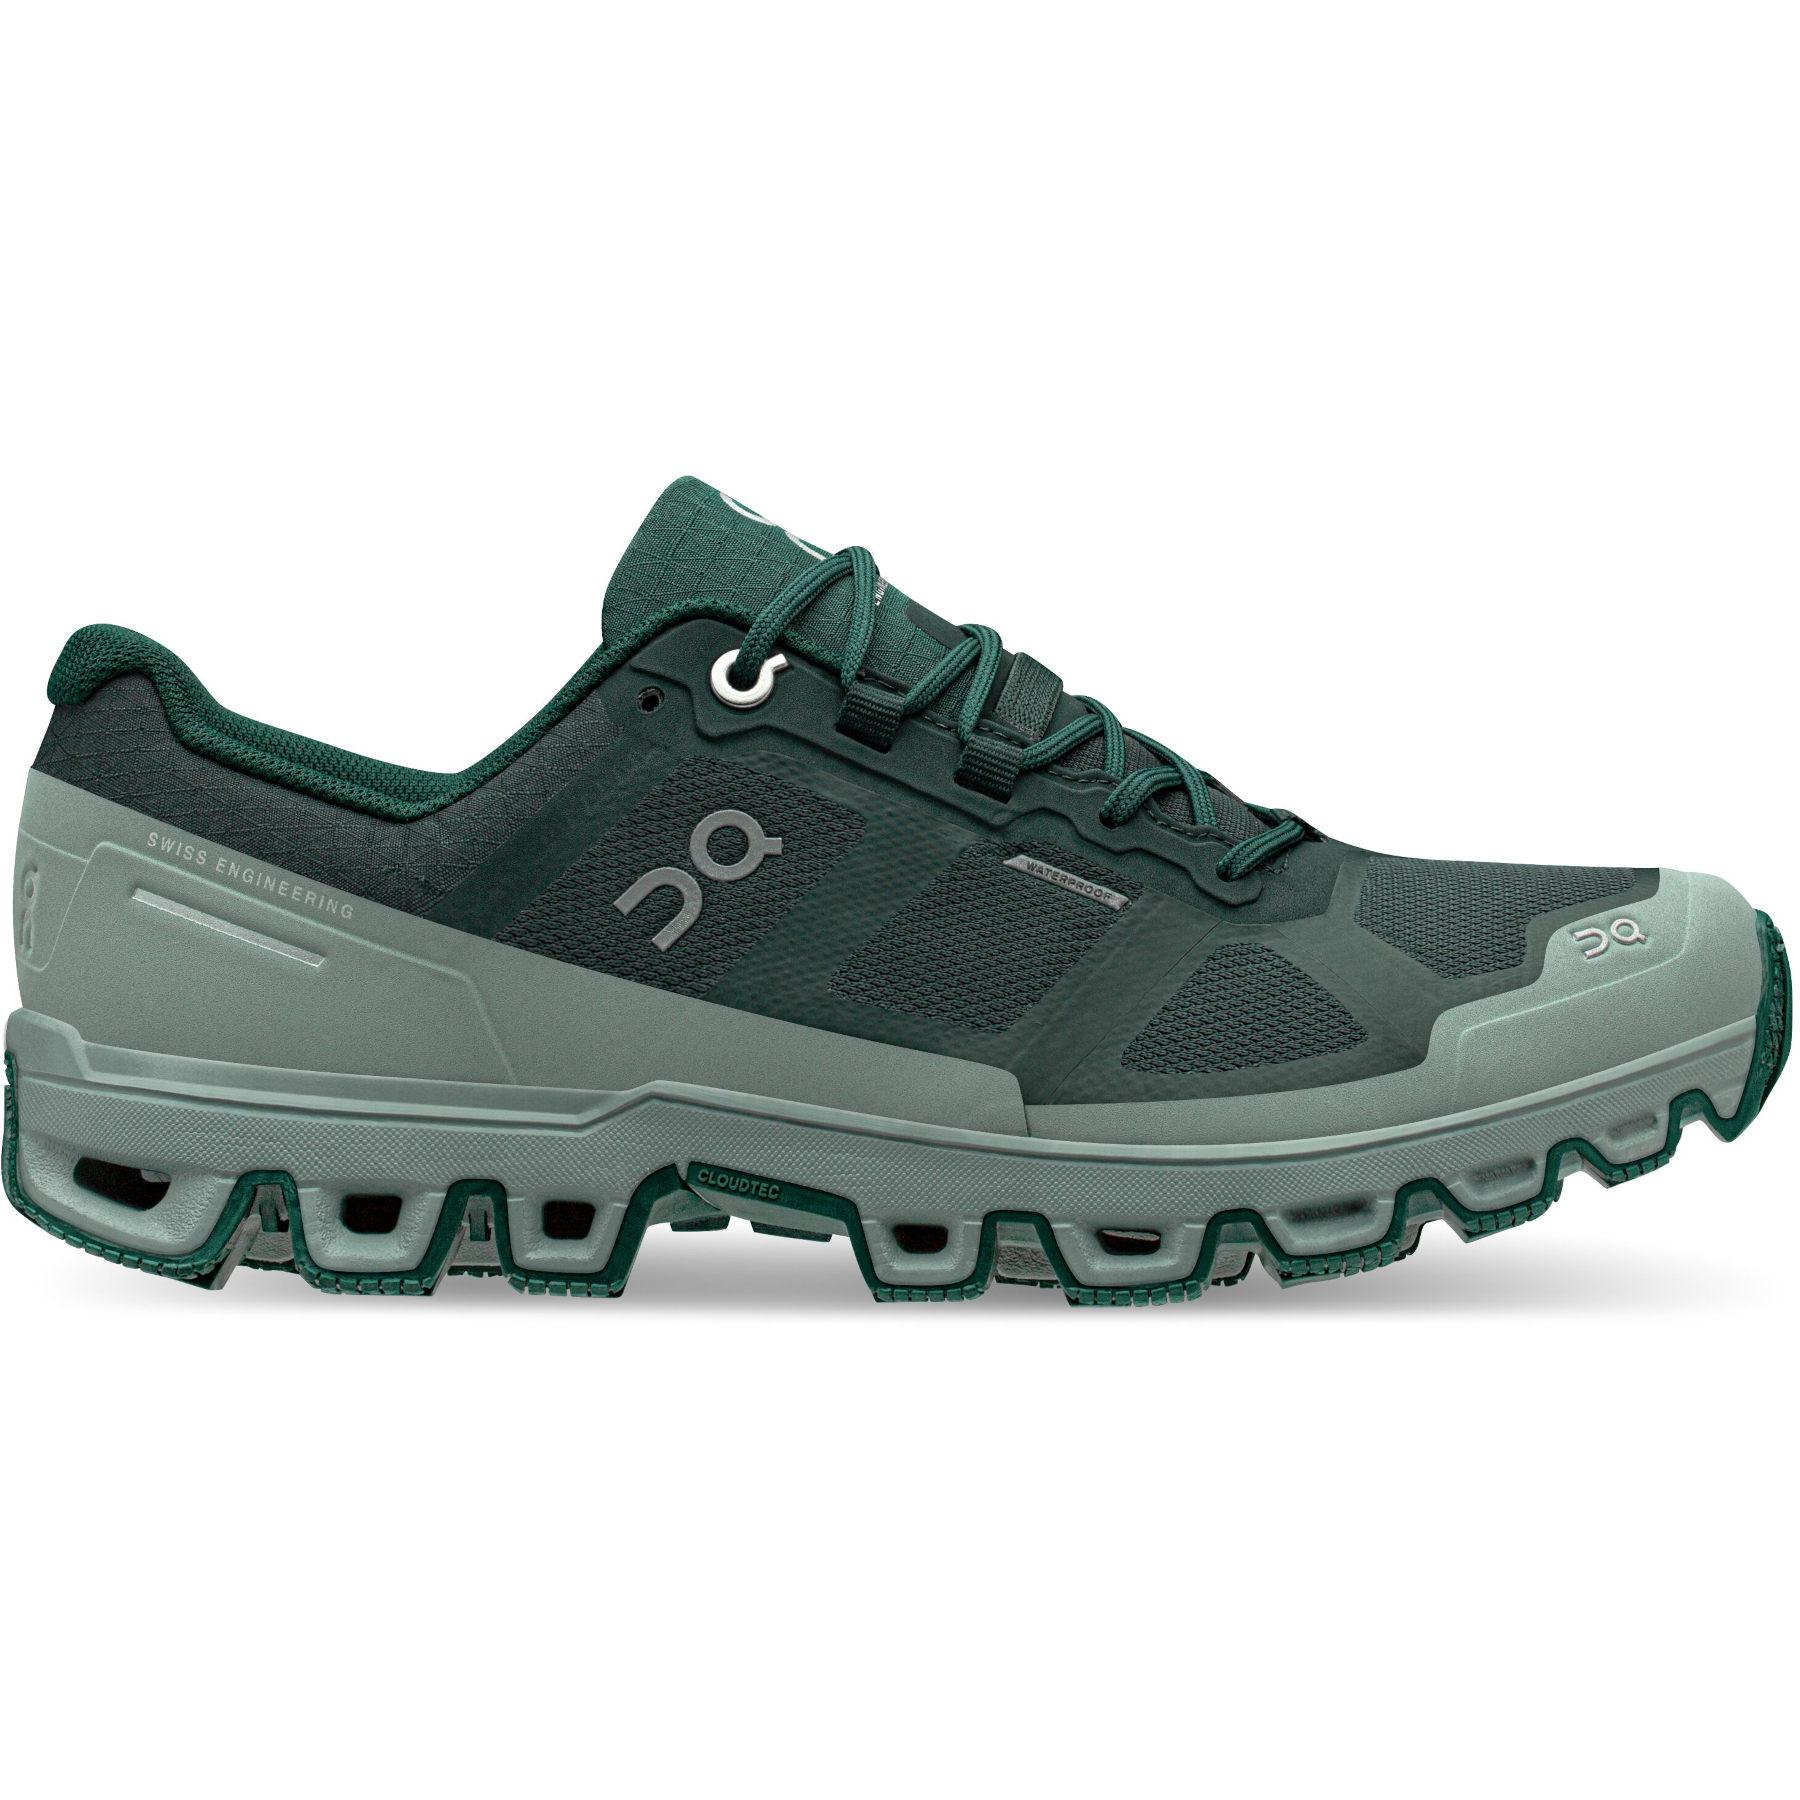 On Cloudventure Waterproof Zapatillas de Trailrunning para Mujer - Juniper & Sea